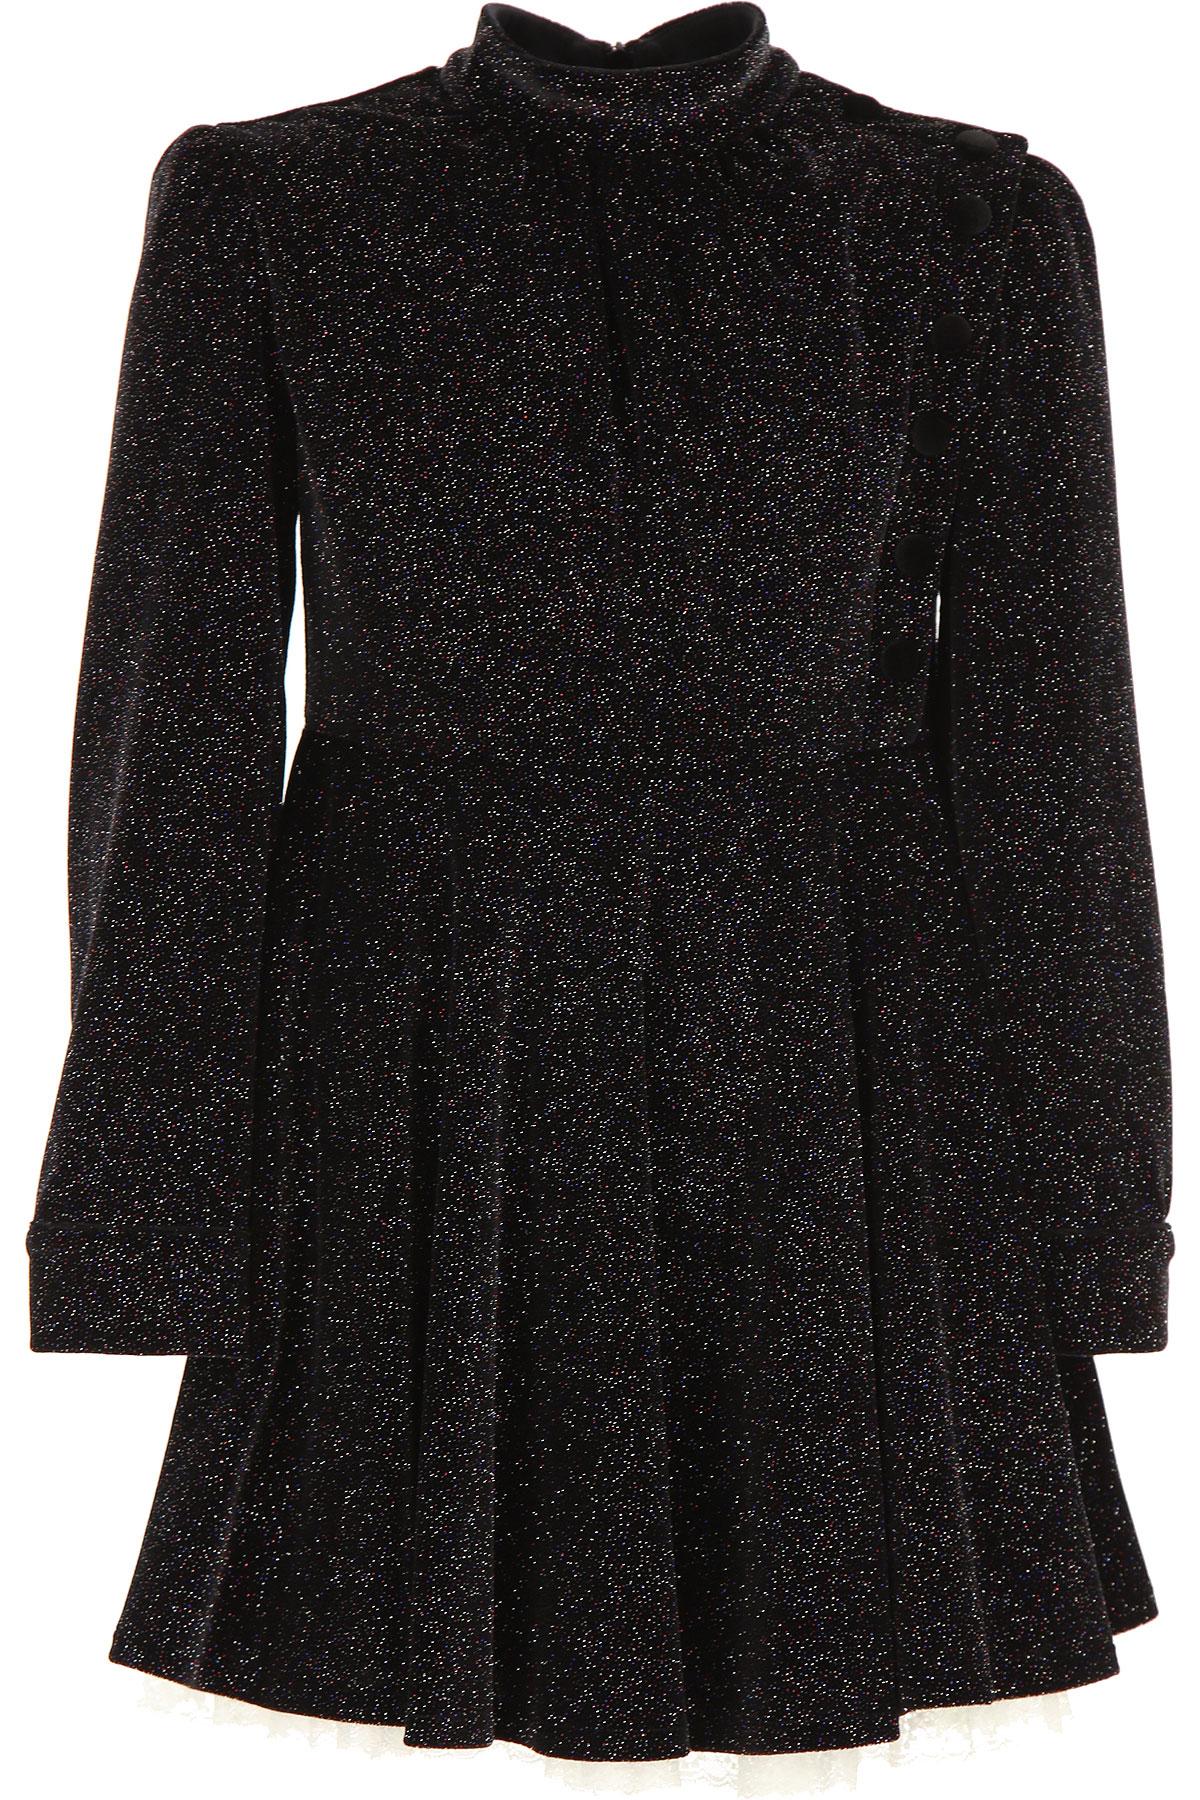 Philosophy di Lorenzo Serafini Girls Dress On Sale, Black, Polyeste, 2019, M S XS